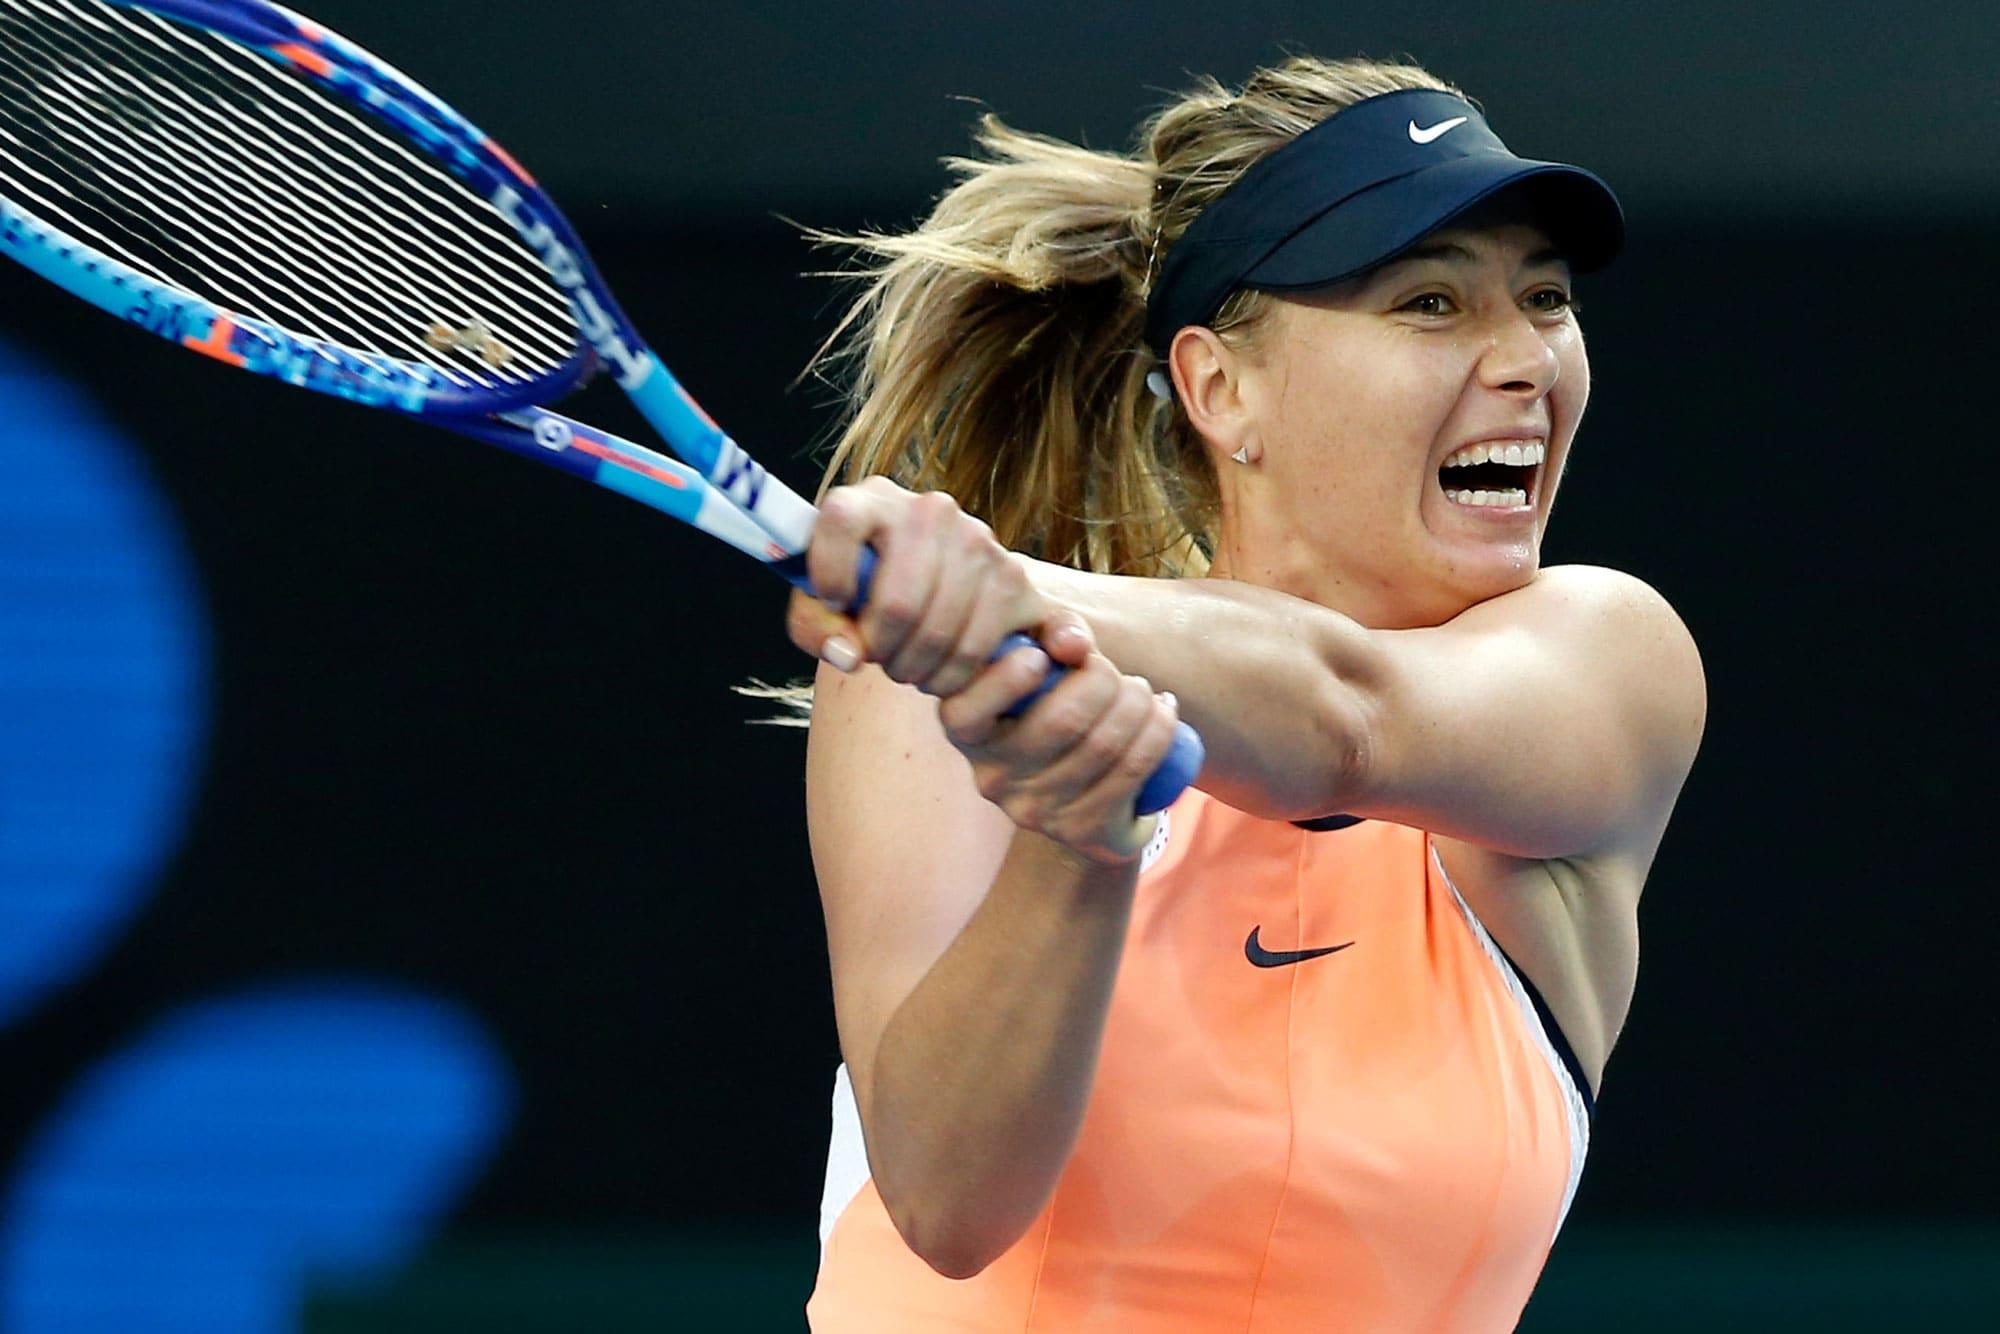 Five-time Grand Slam winner Maria Sharapova retires